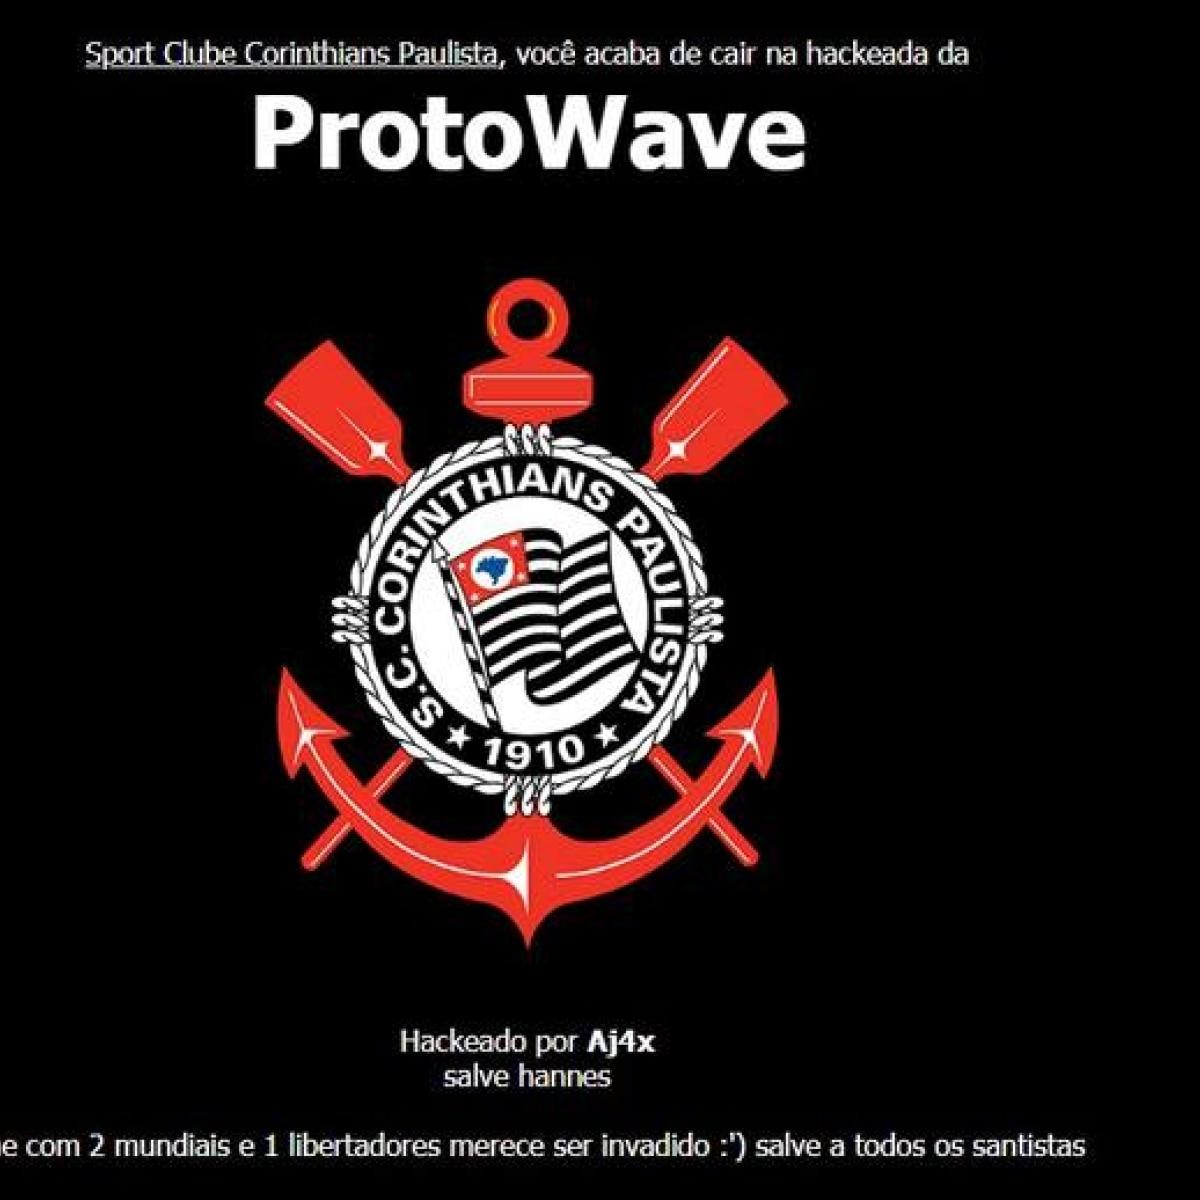 ab57d91218078 Site oficial do corinthians hackeado salve a todos os santistas futebol  fera jpg 1200x1200 Clube corinthians